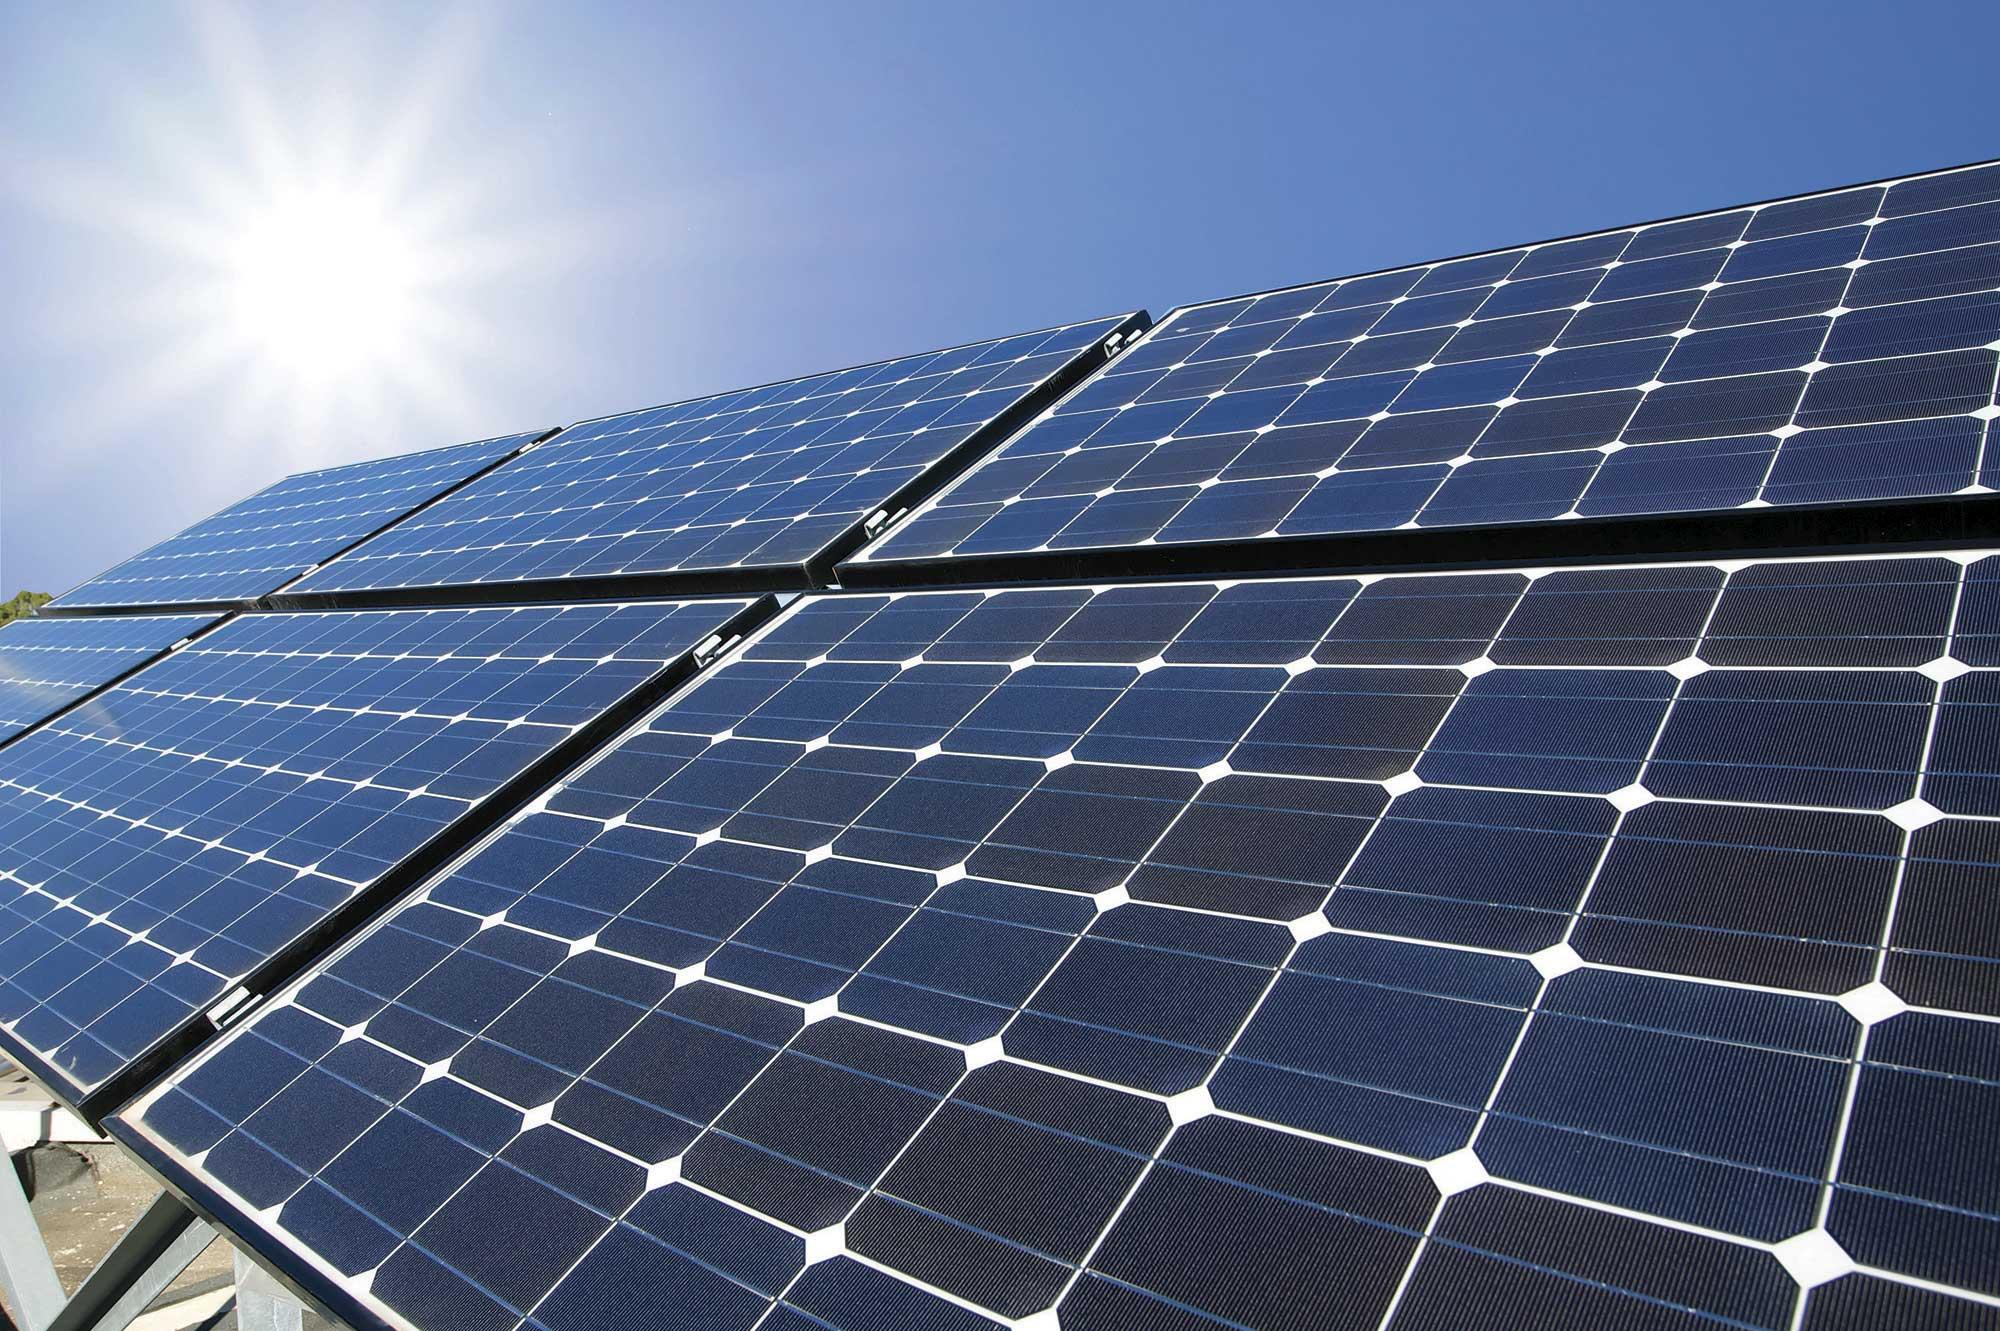 Cientistas criam dispositivo para gerar energia solar e resfriar ambiente